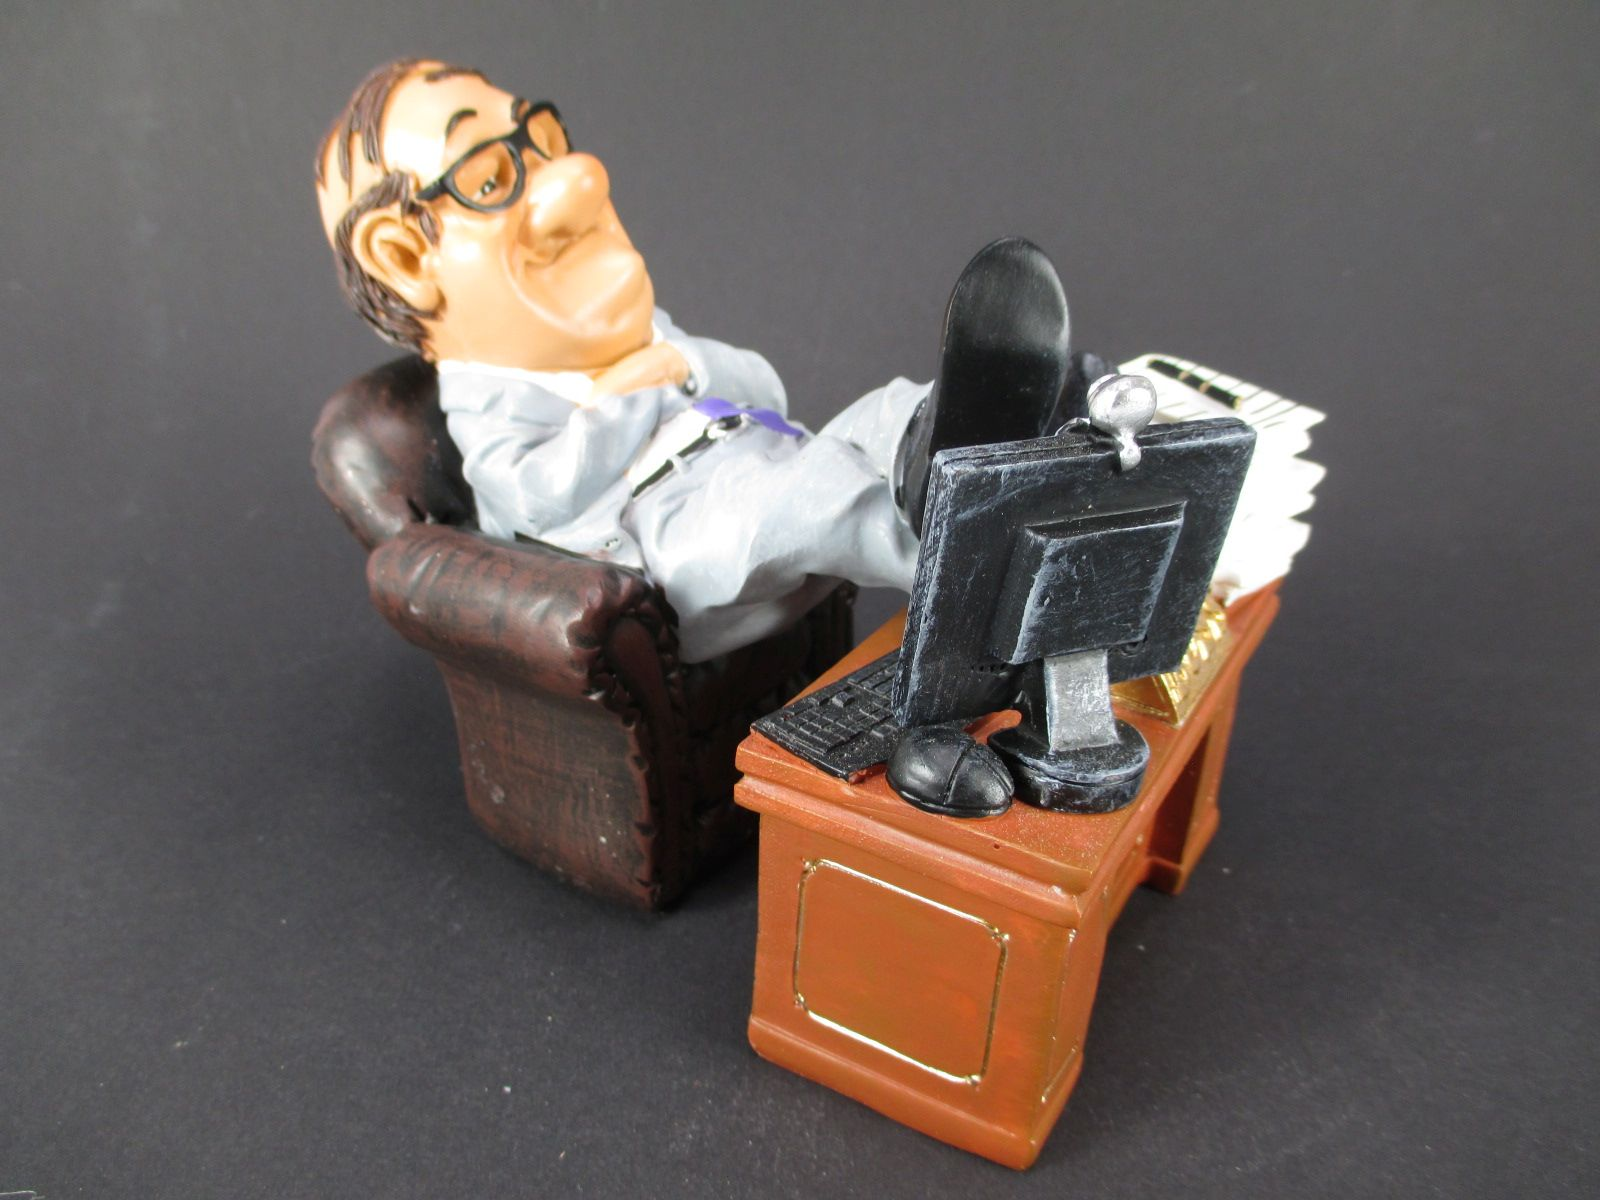 Kartenspieler Funny,14 cm,Beruf Profession Figuren Kollektion,Neu